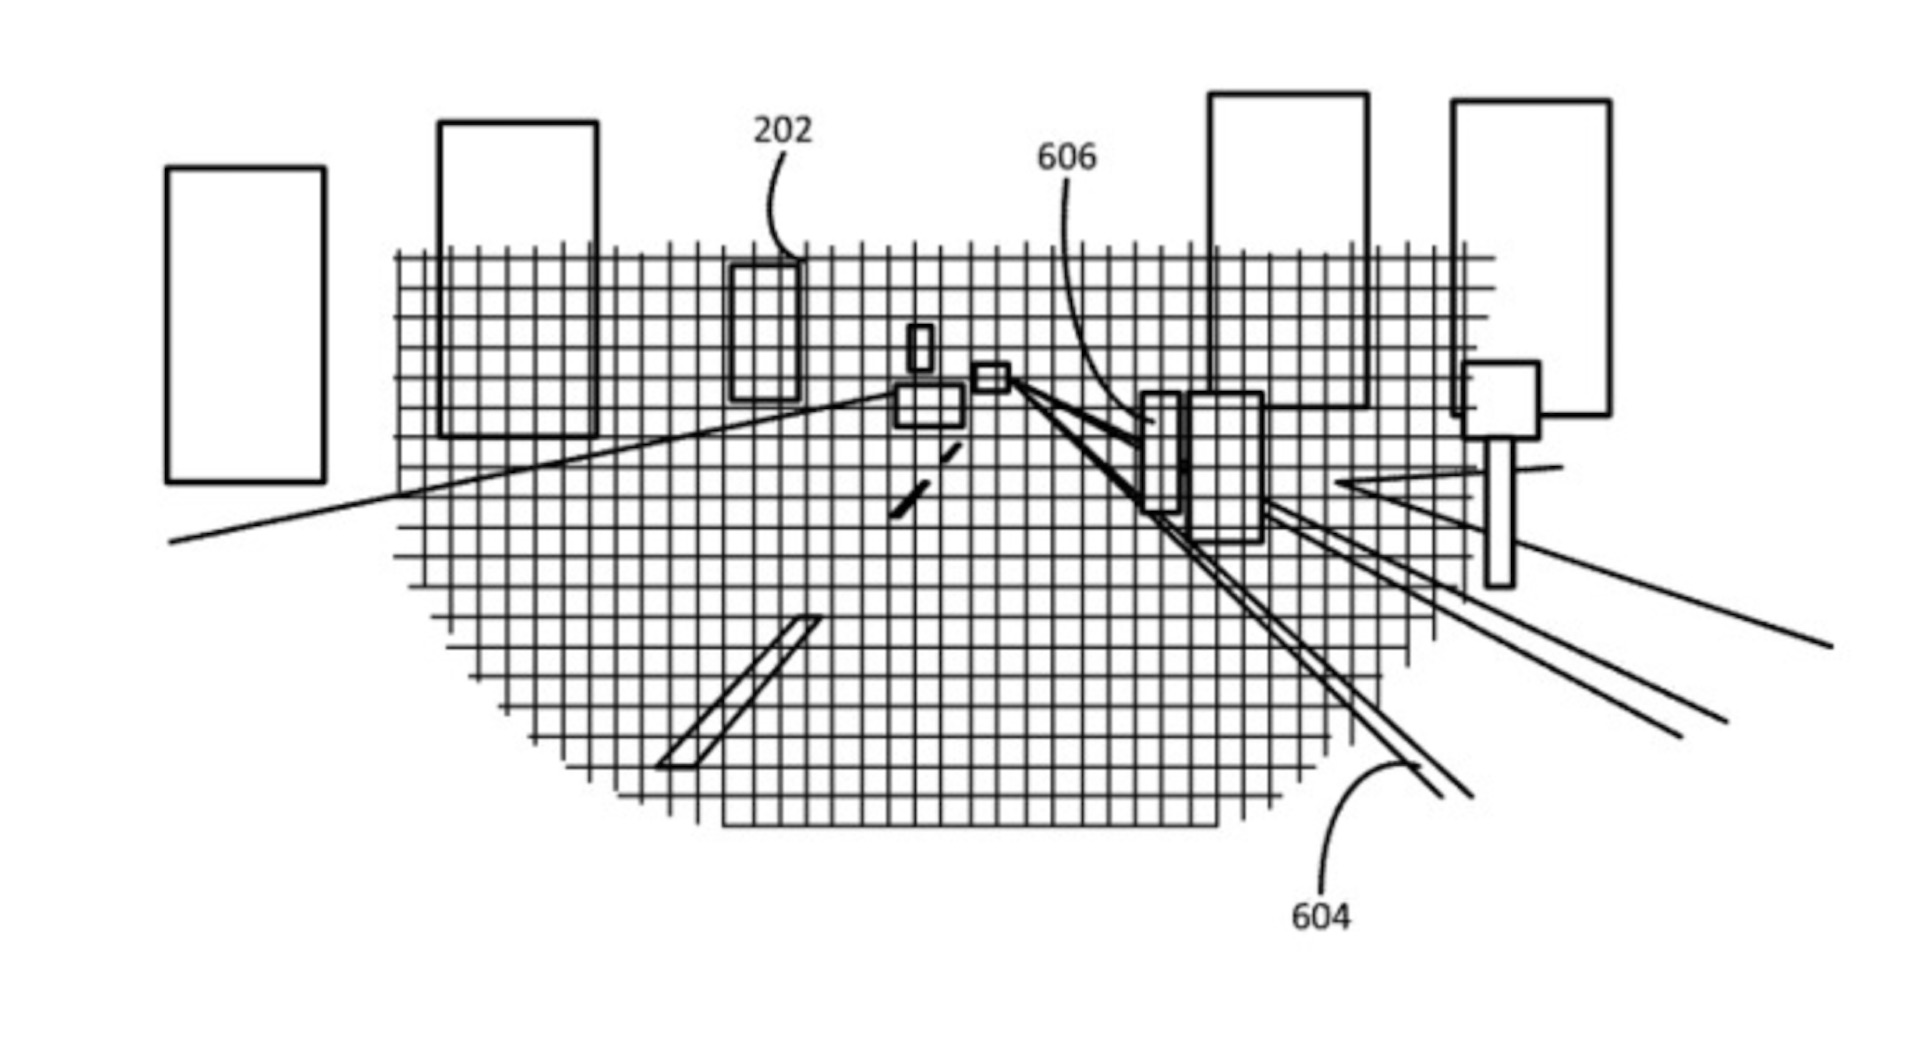 apple files patent for hazard